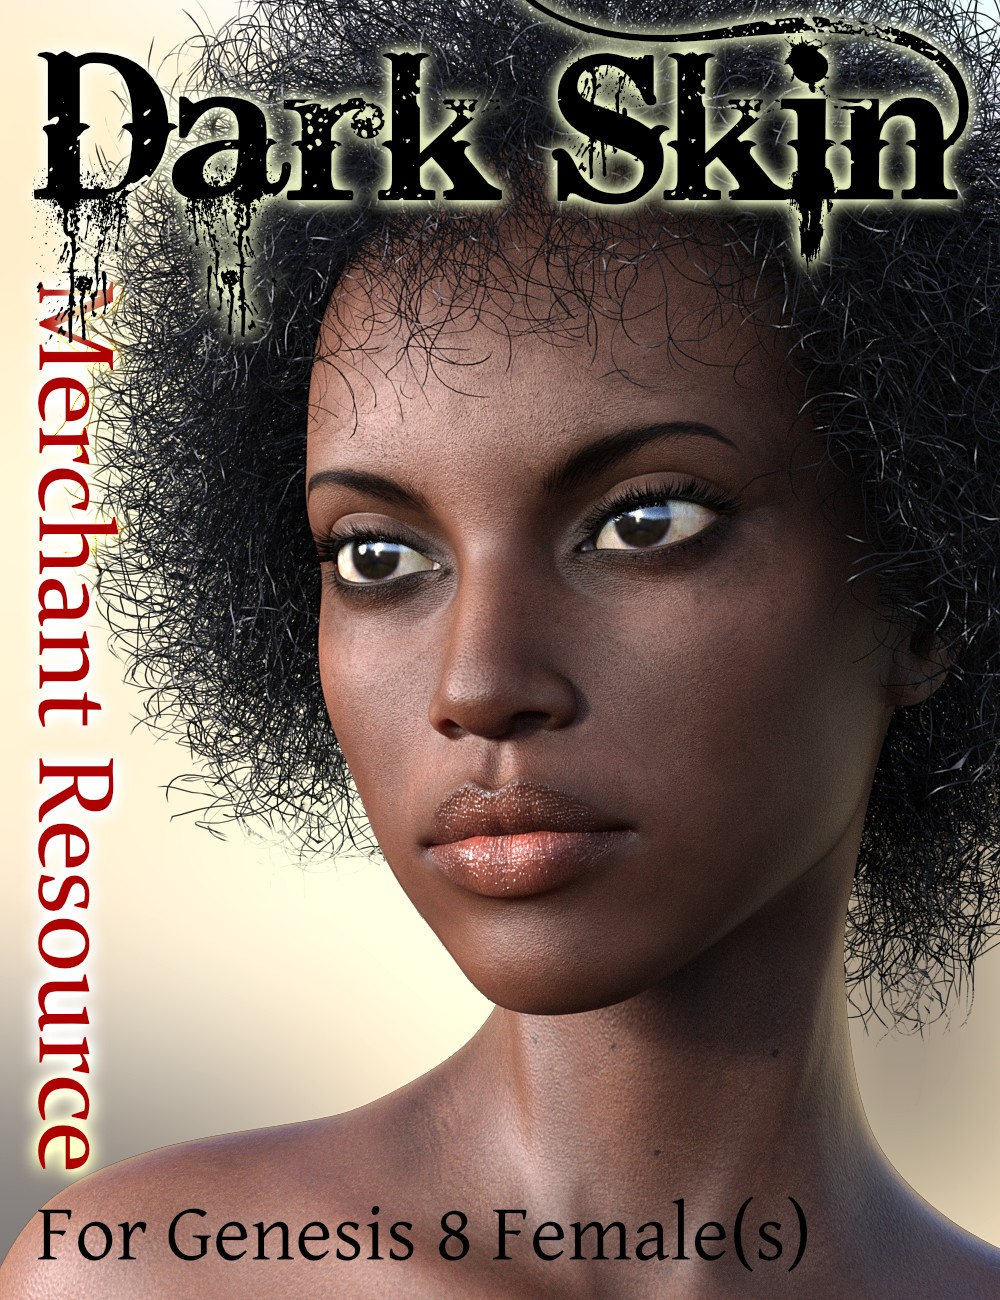 Dark Skin Merchant Resource for Genesis 8 Female(s)